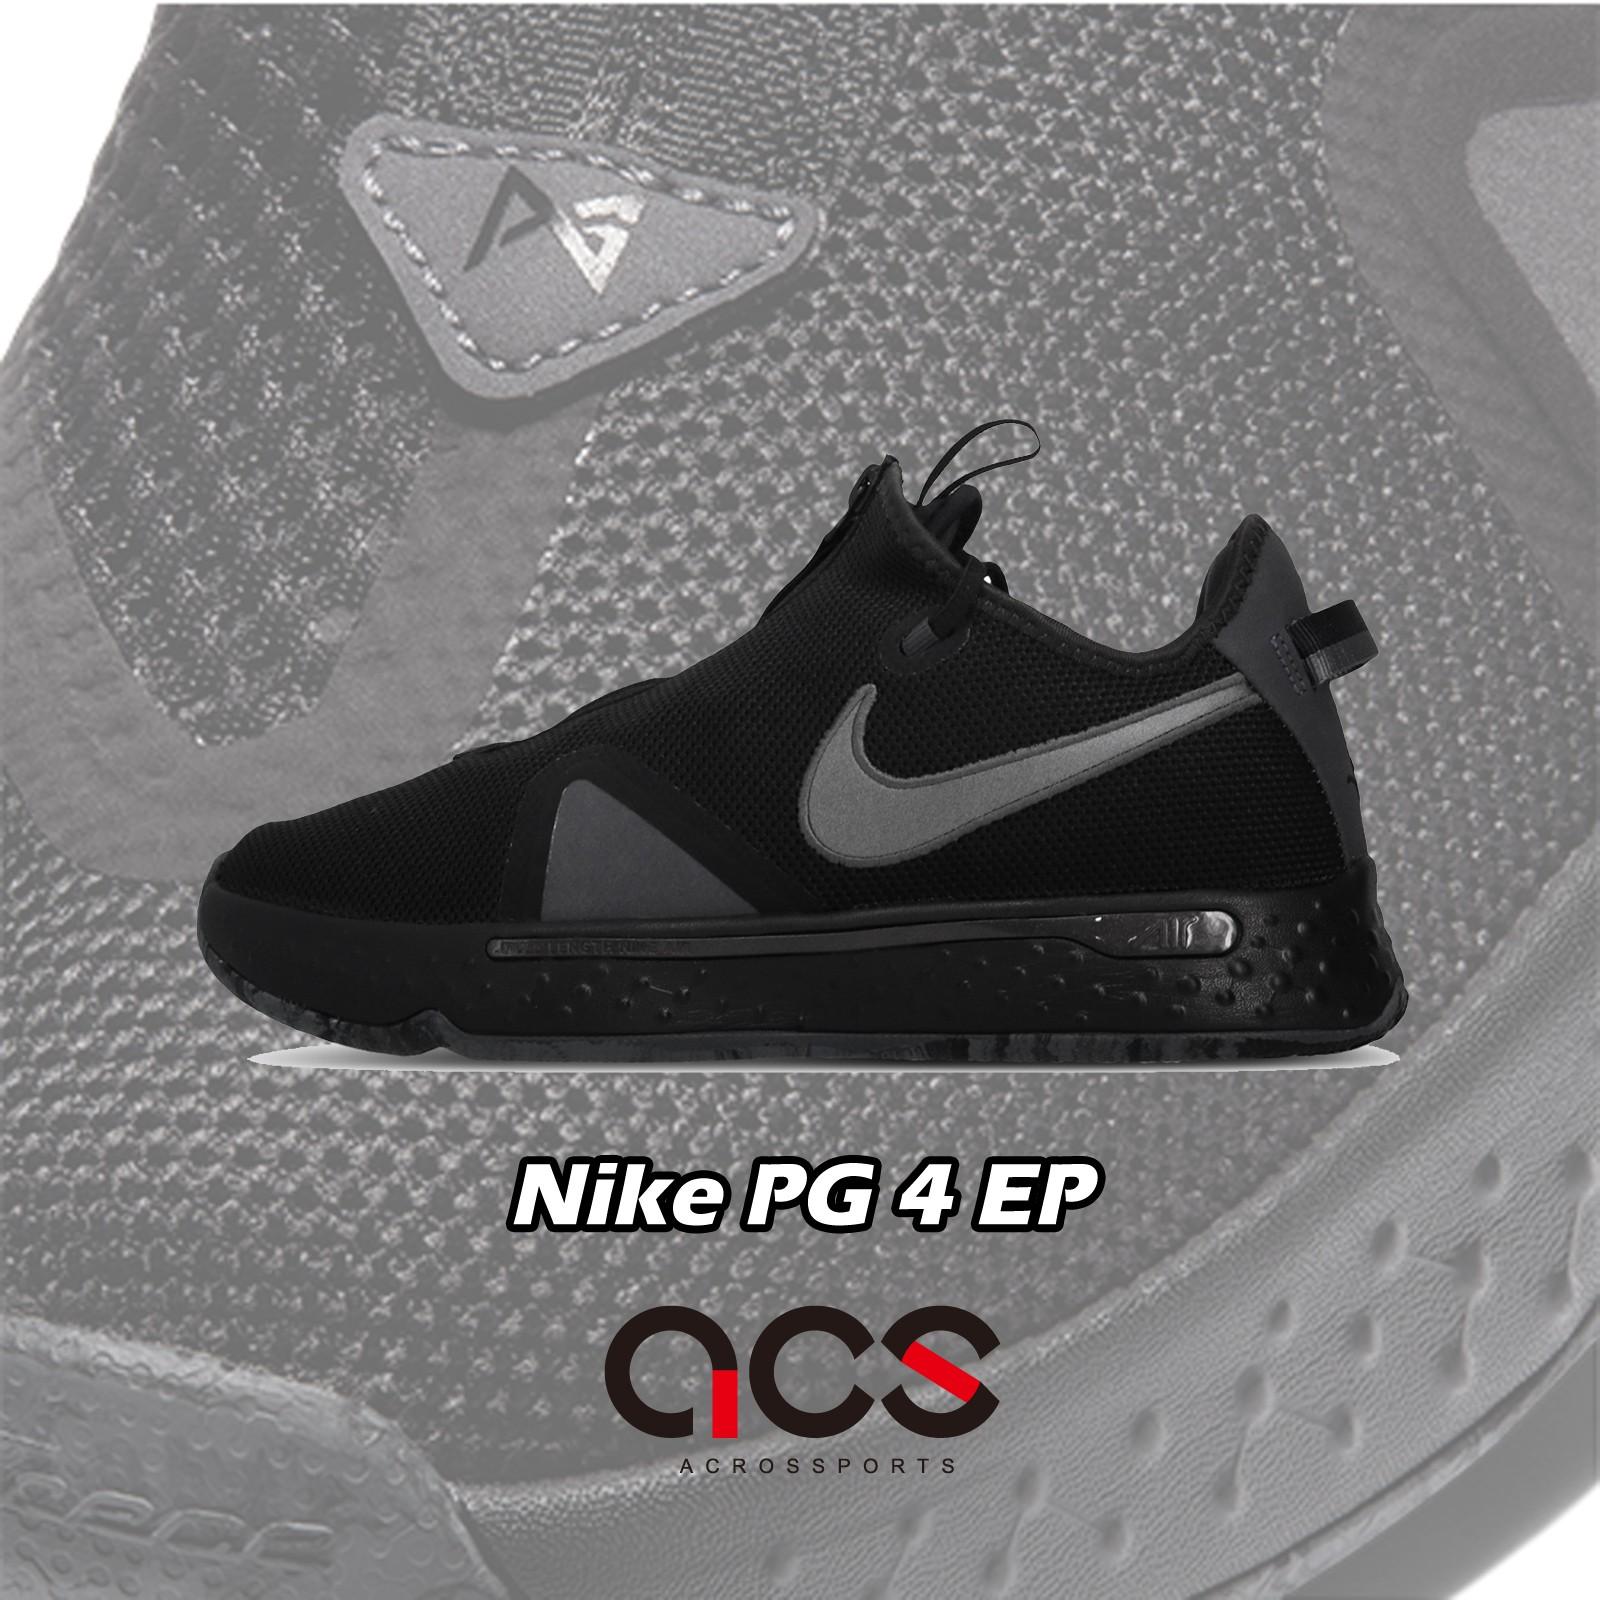 Nike 籃球鞋 PG 4 EP 黑 灰 拉鍊 Paul George 男鞋 喬治【ACS】 CD5082-005